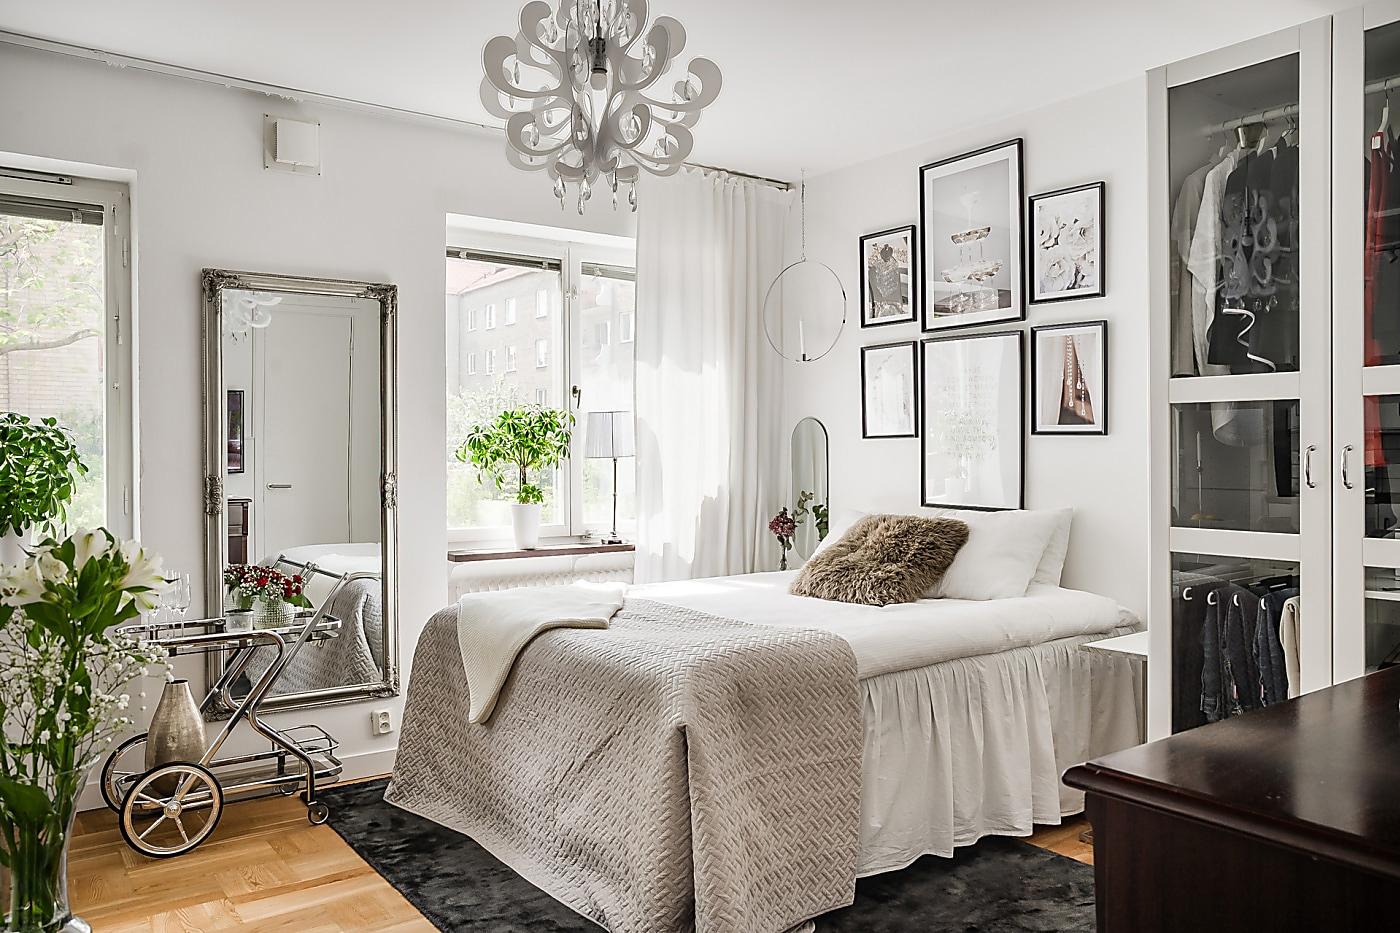 Интерьер скандинавской квартиры-студии 28 кв.